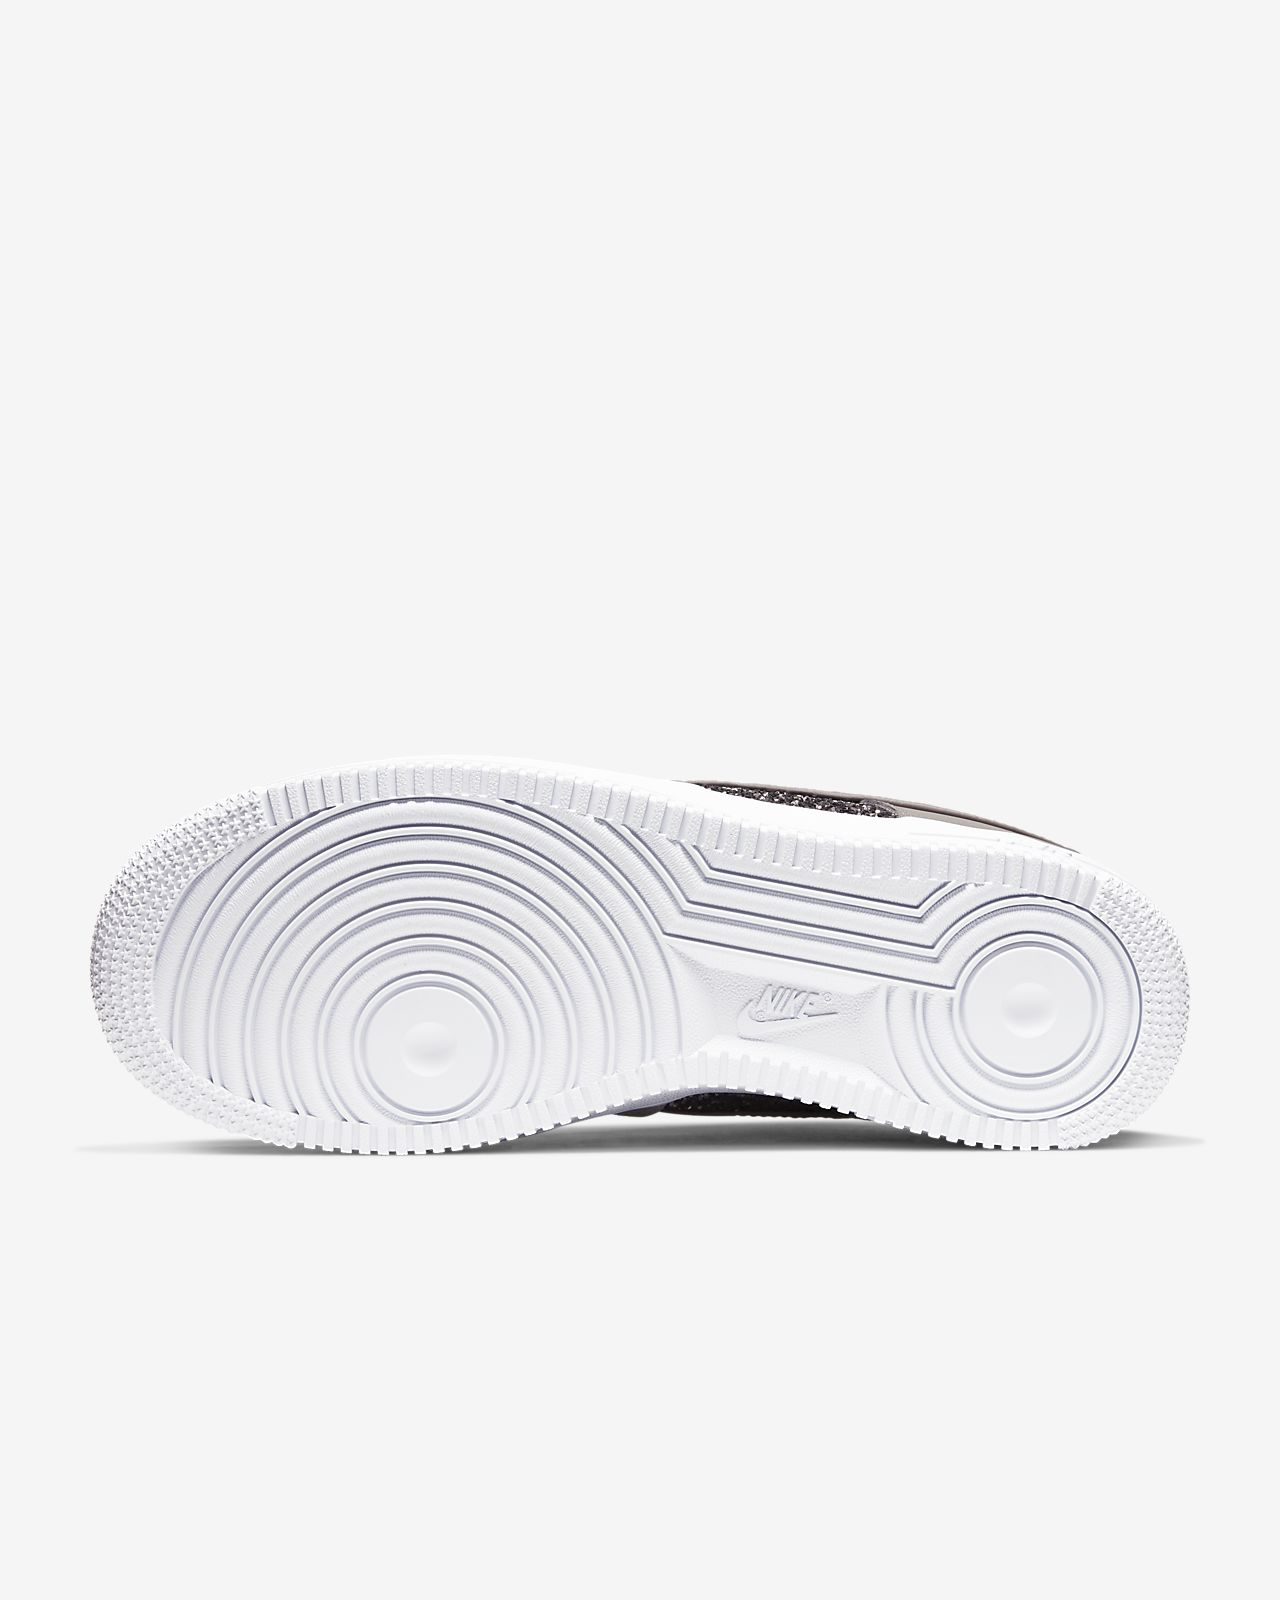 Zapatillas casual de mujer Air Force 1 Low Glitter Nike